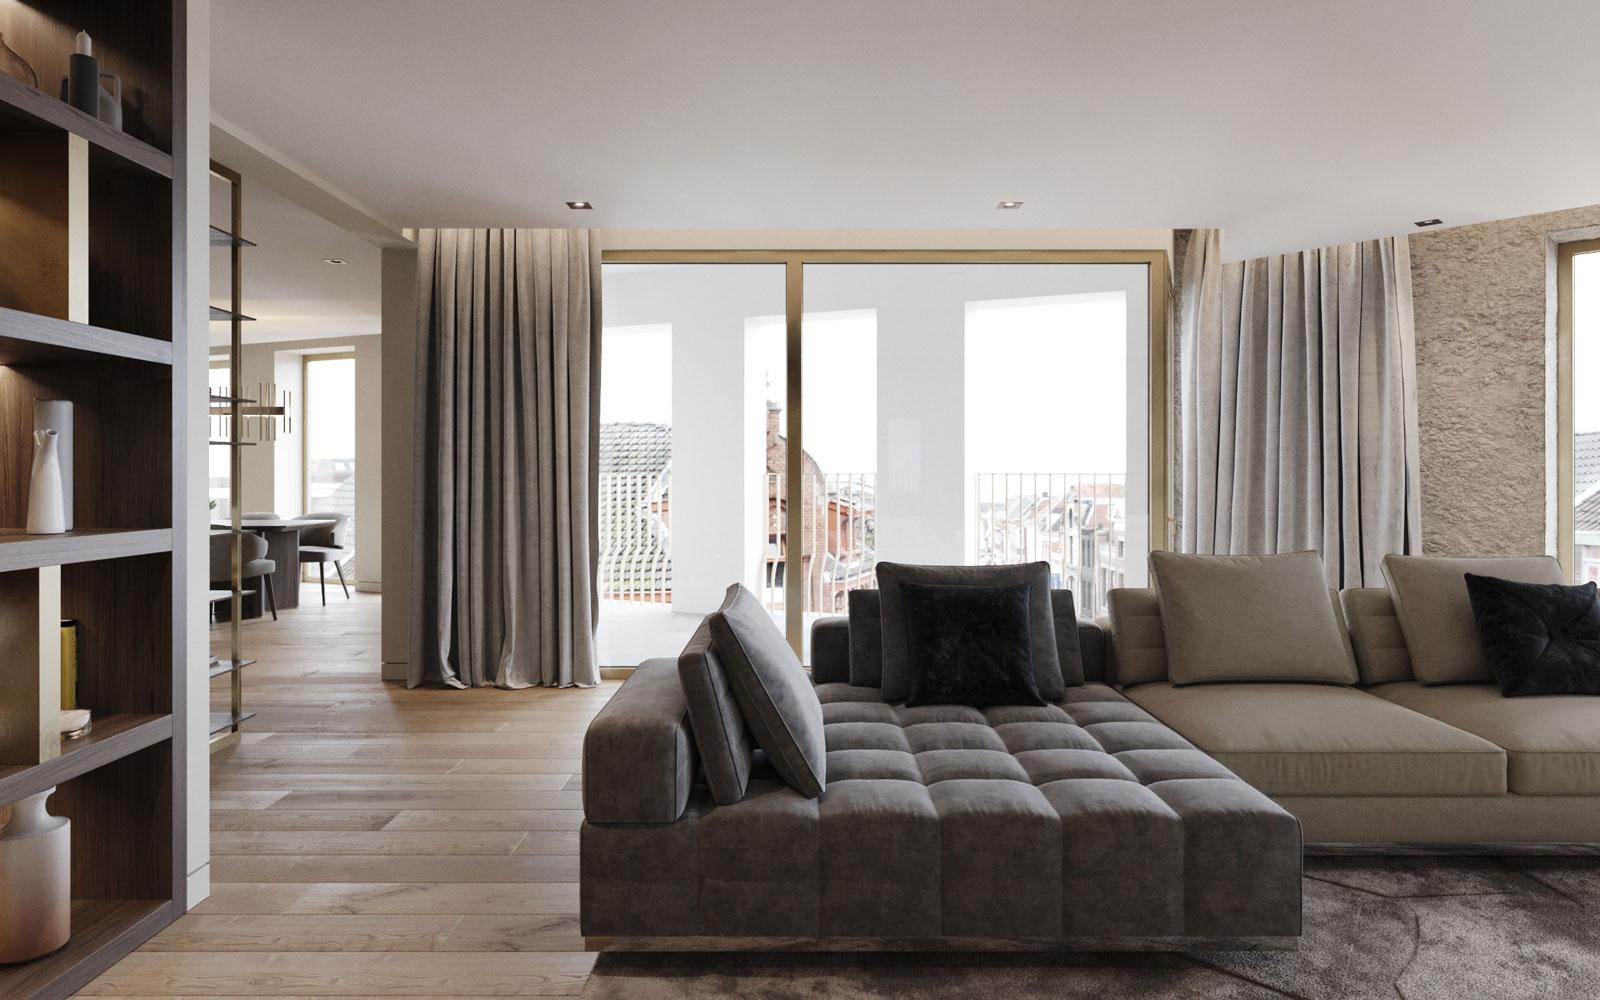 Duin Interior, exclusief interieur, interieur, inrichting, marmer, nilson bedden, bulthaup keuken, The Art of Living Online